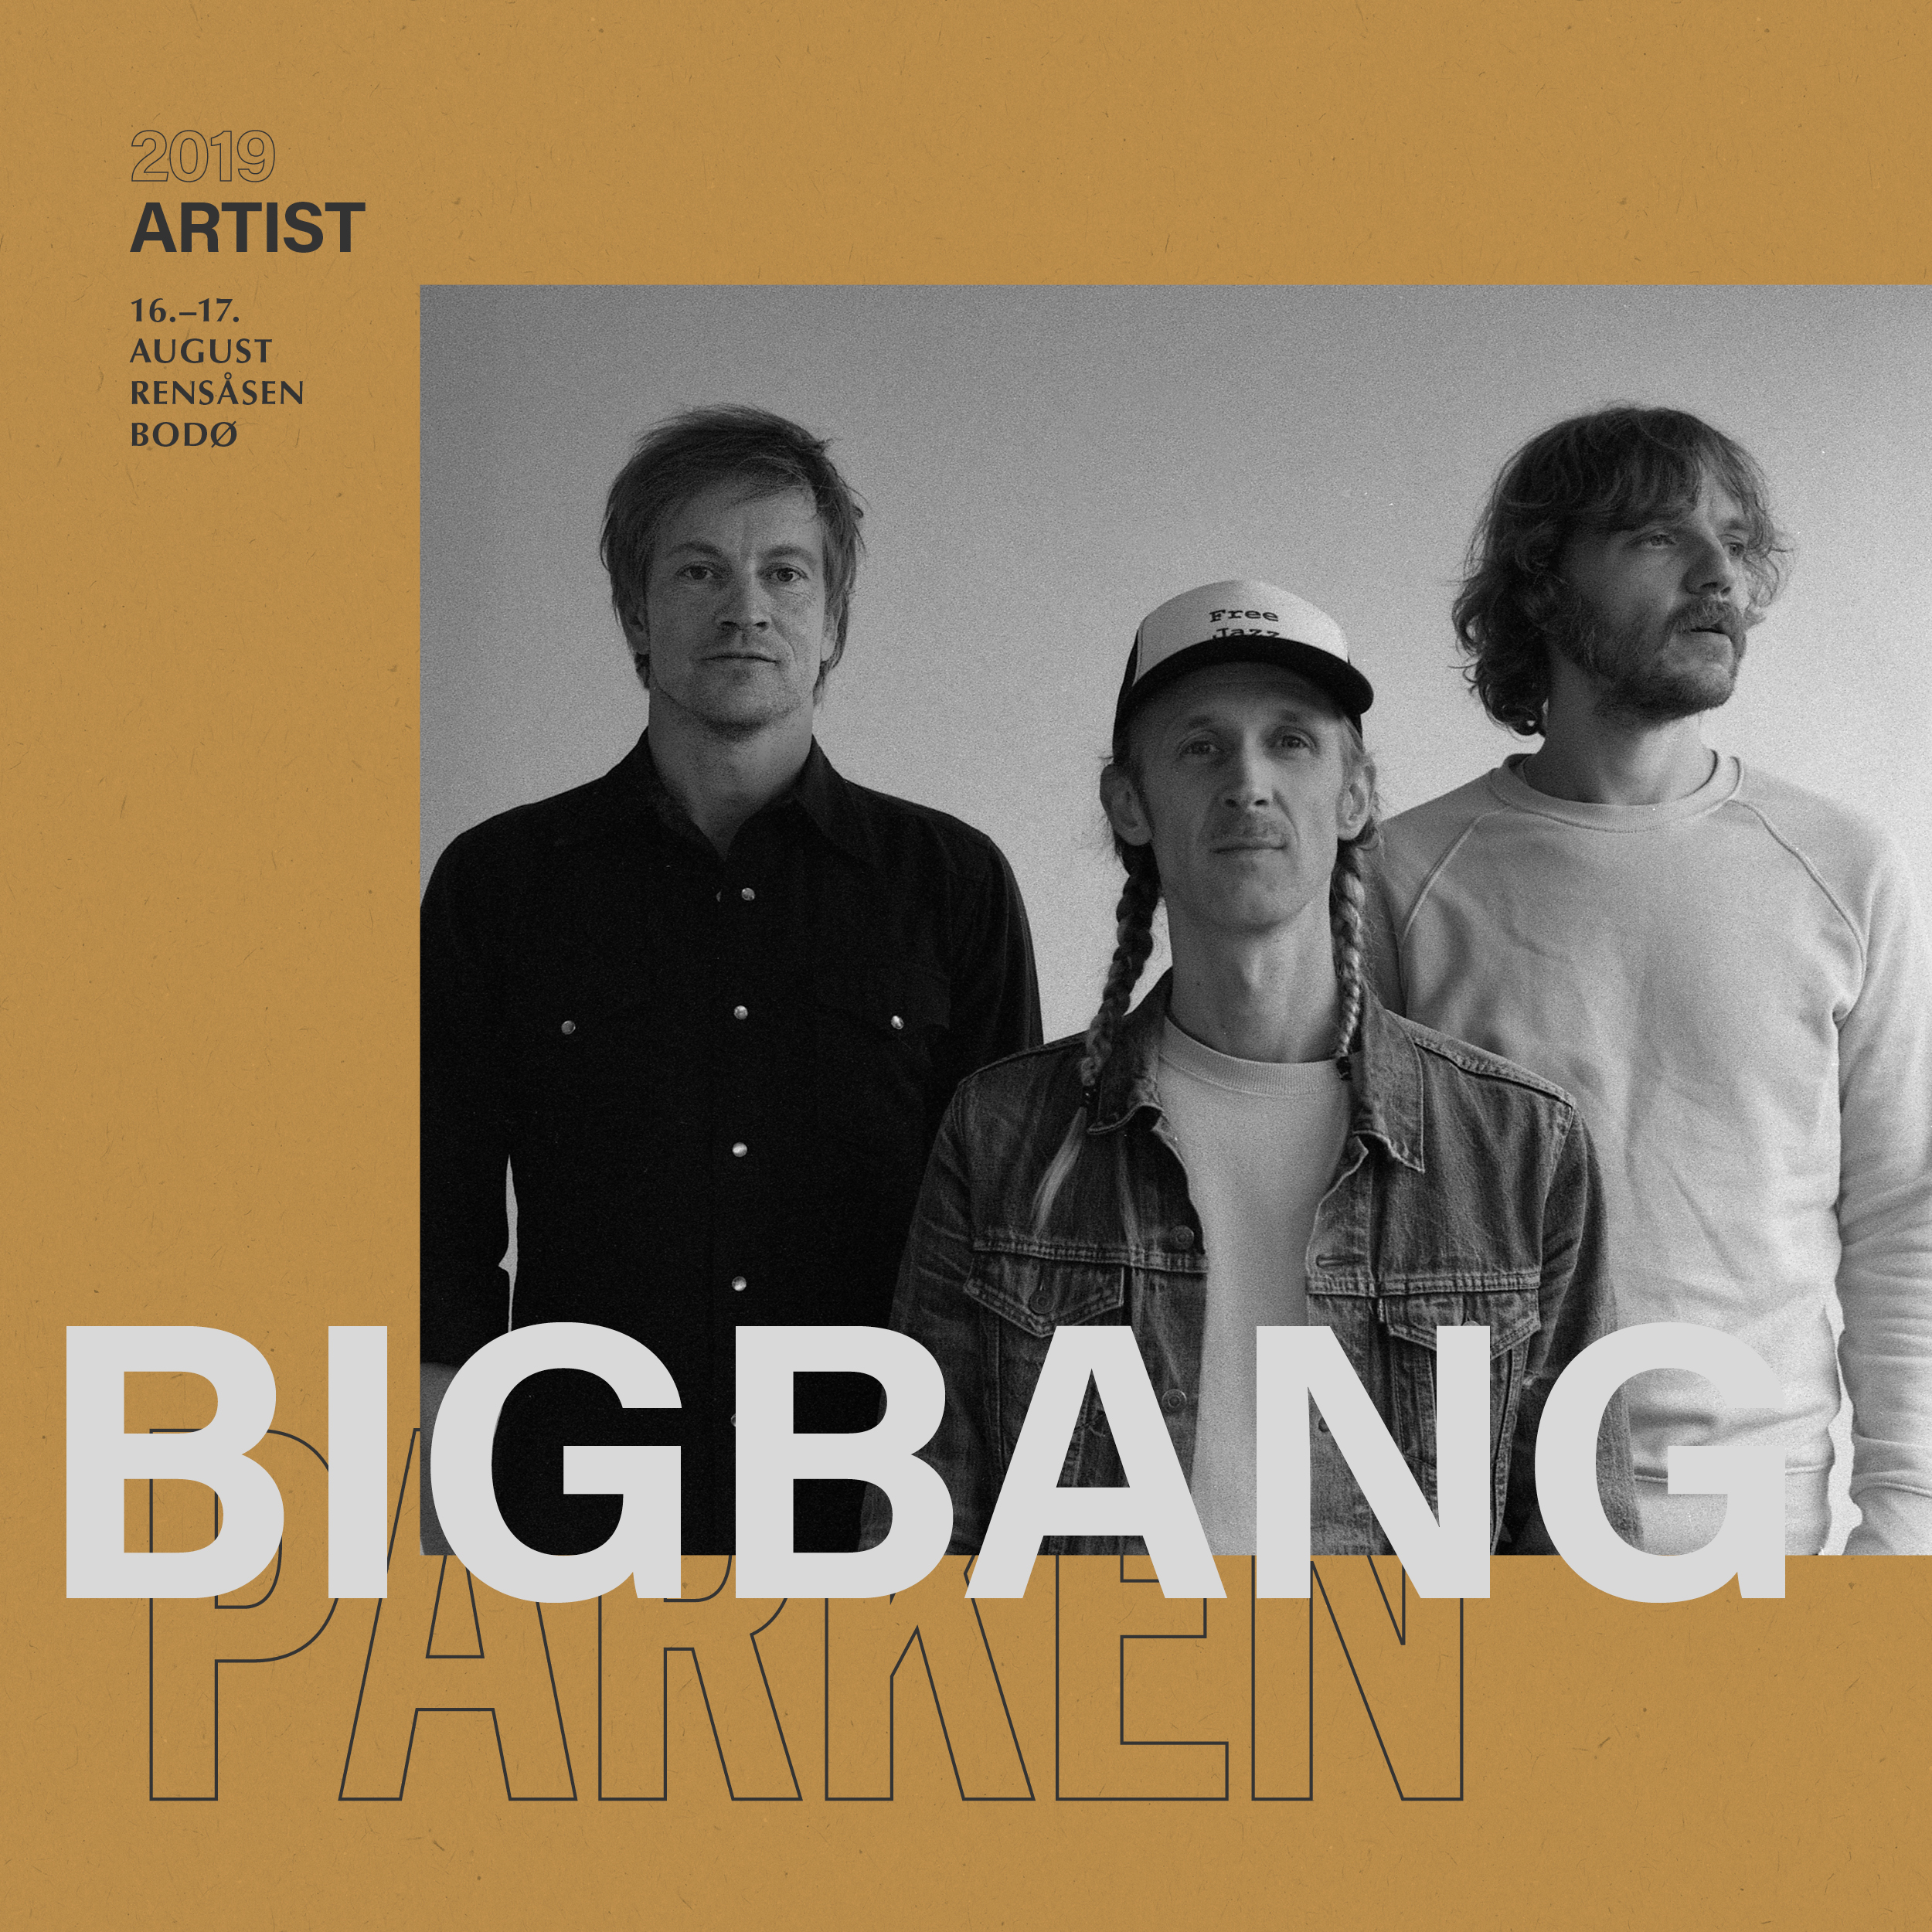 BYRAA_Parken_Artistslipp_2019_Bigbang_1200x1200px.jpg